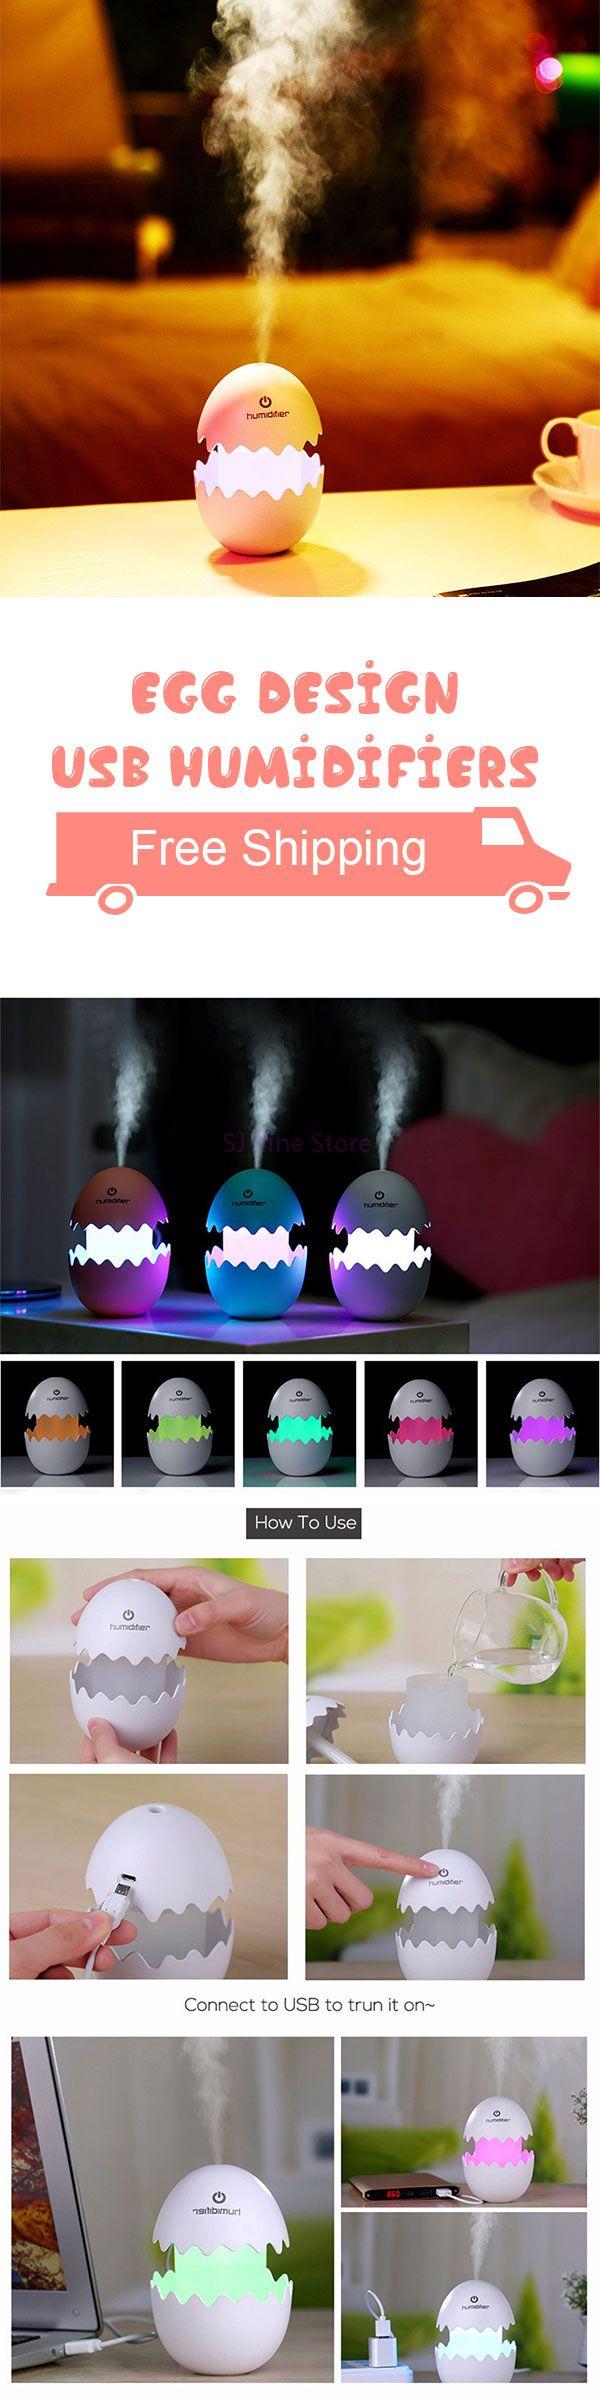 White Mini Humidifiers Egg Design USB Electric Ultrasonic Aroma Cool Mist